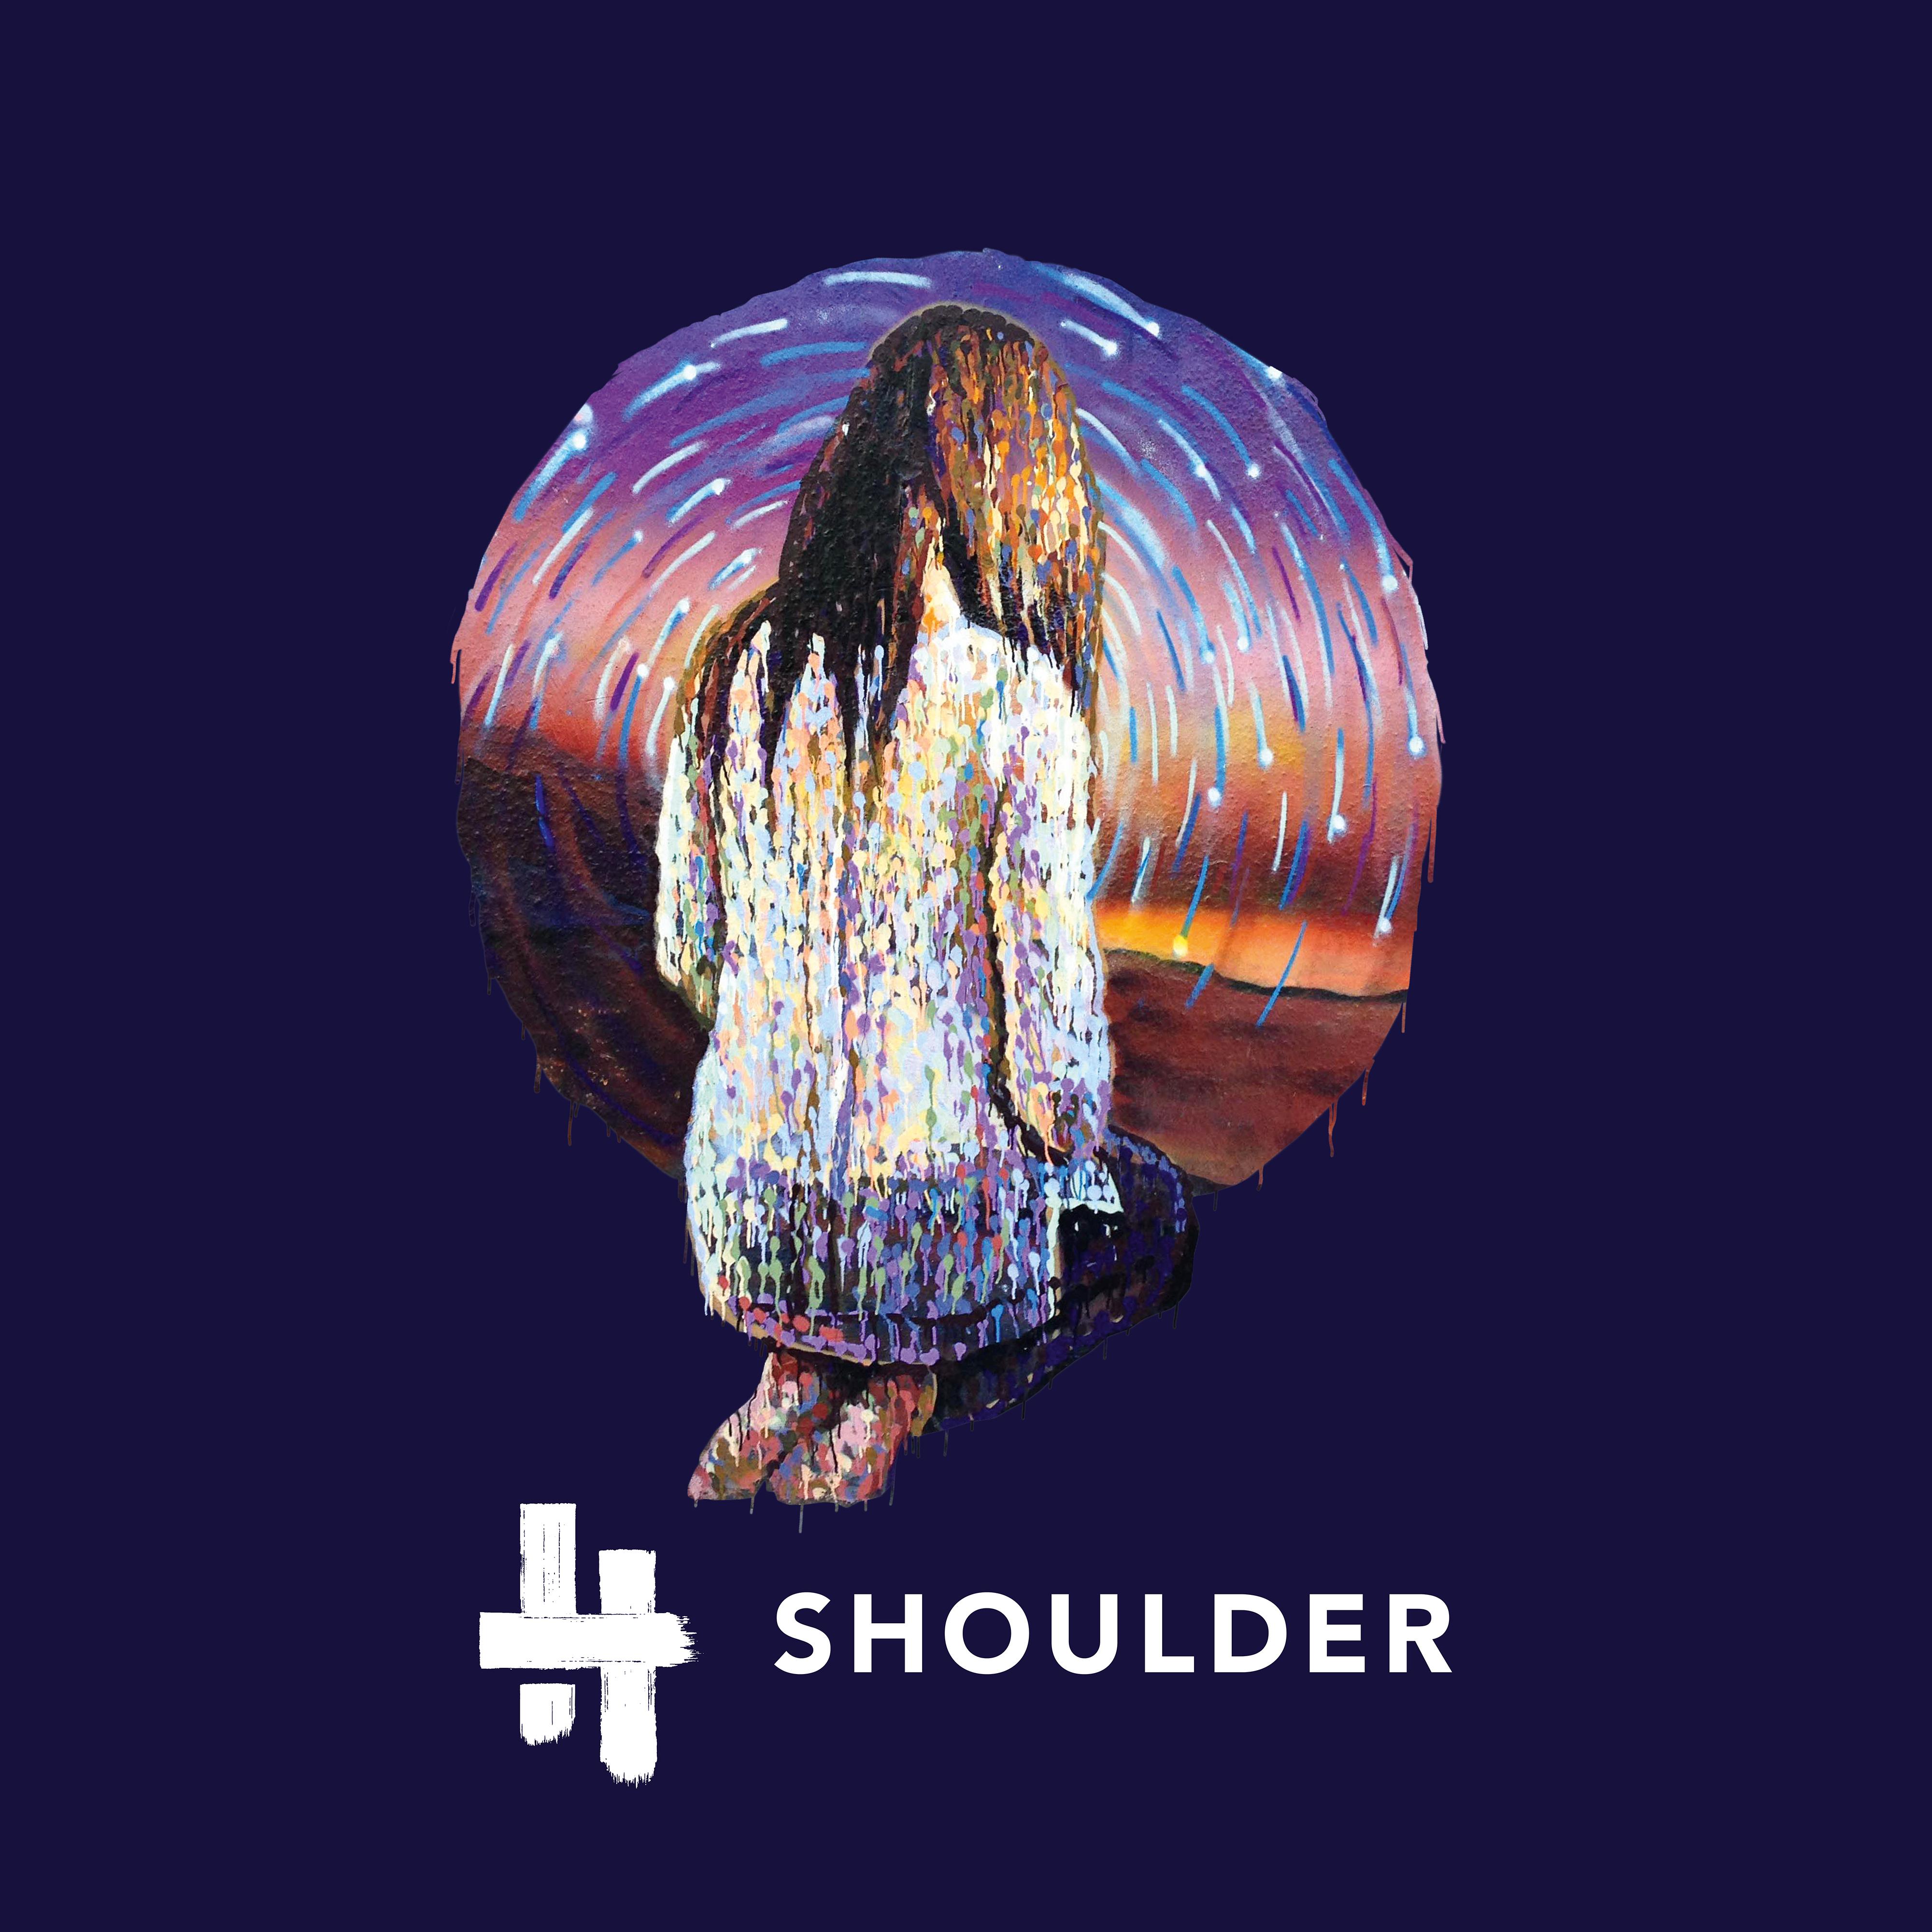 hitimpulse_shoulder_artwork_dec2017.jpg